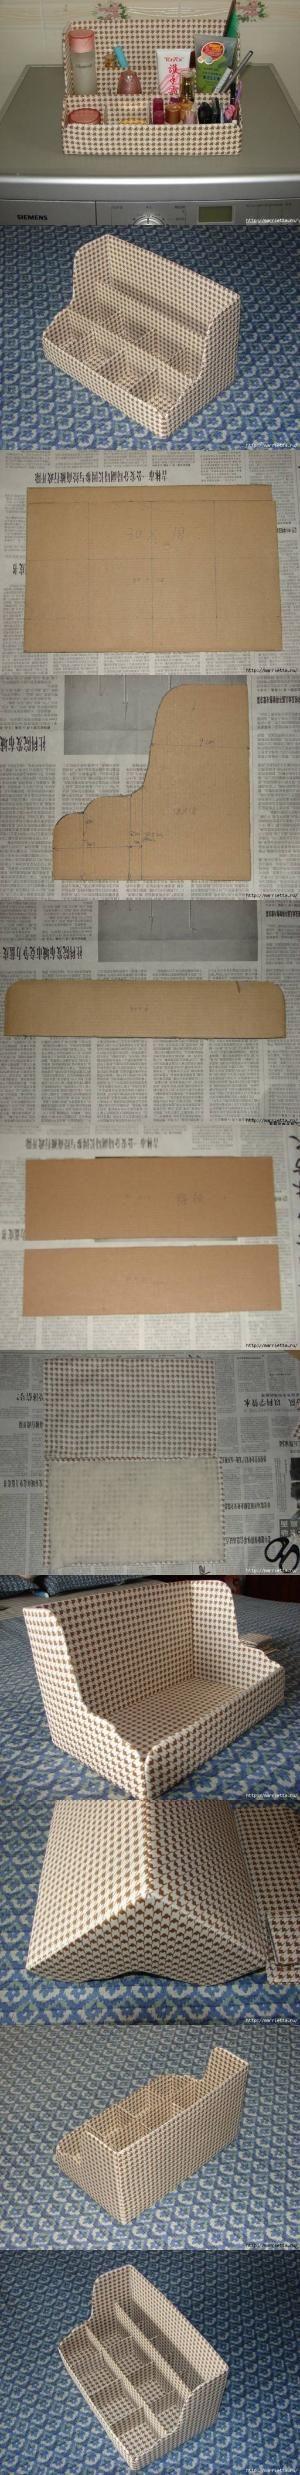 How to make Cardboard Shelves Organizer DIY tutorial instructions , How to, how to do, diy instructions, crafts, do it yourself, diy website by Mary Smith fSesz